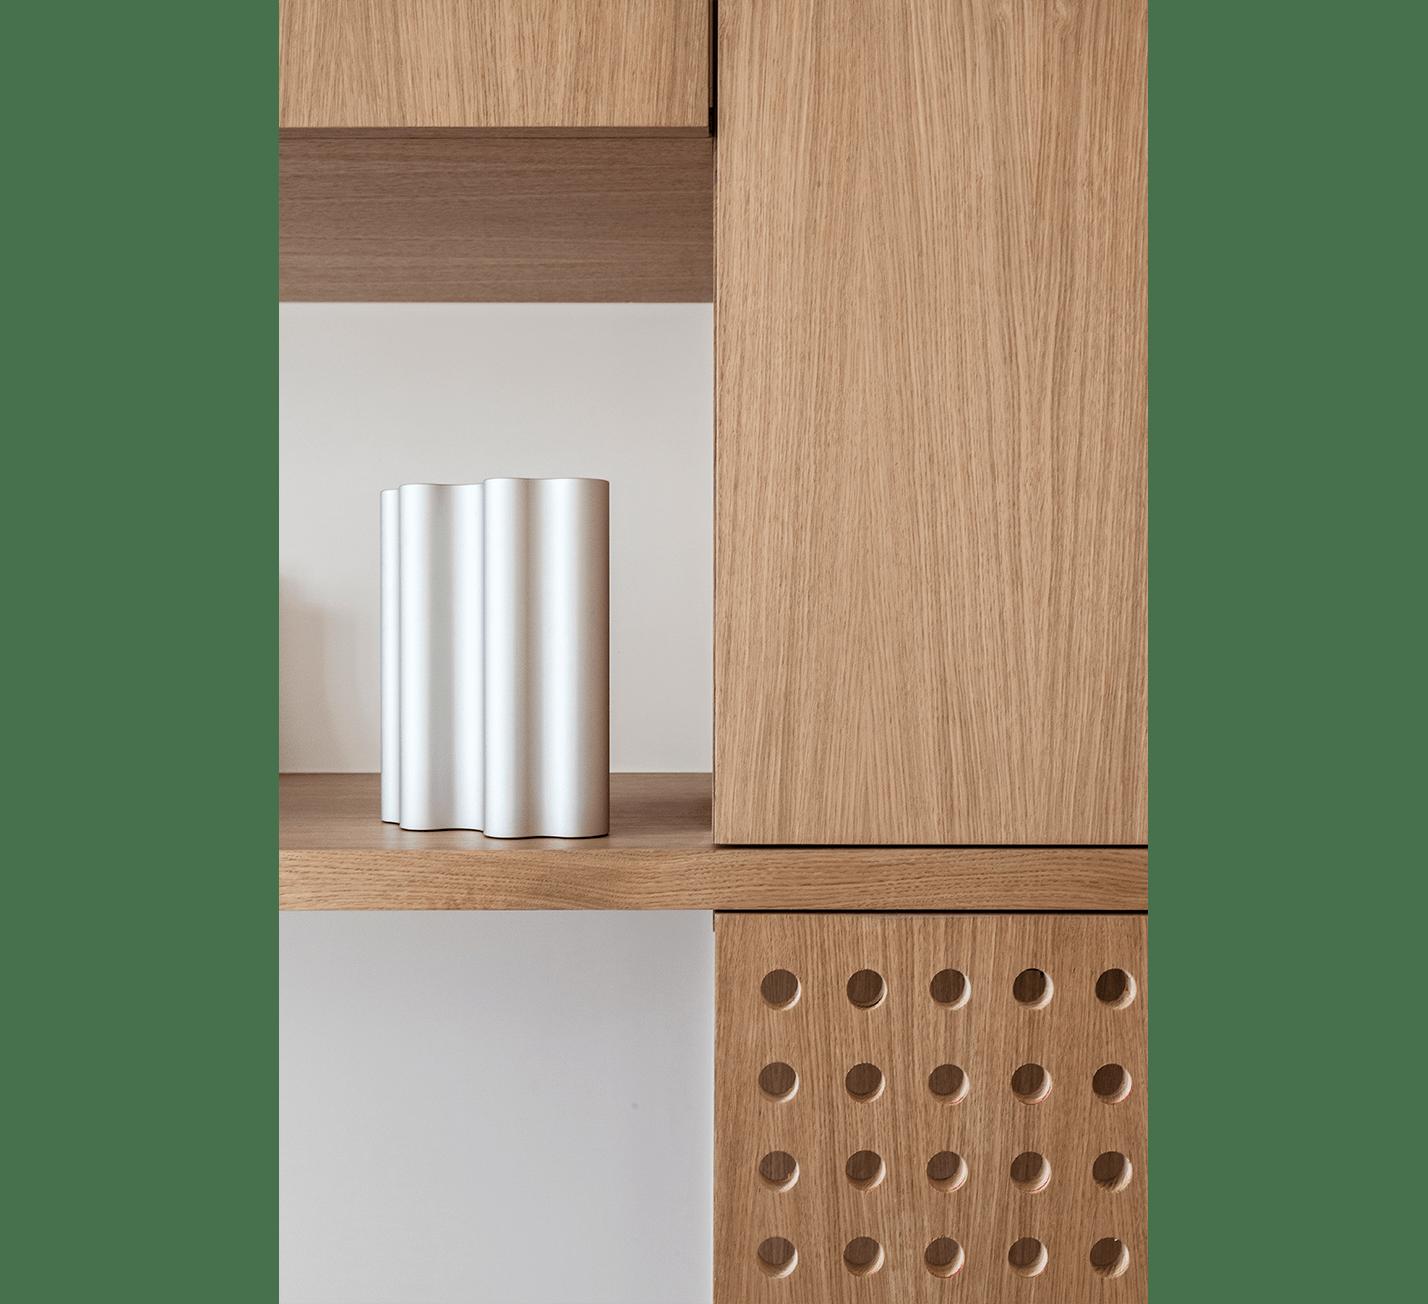 Projet-Cavallotti-Atelier-Steve-Pauline-Borgia-Architecte-interieur-09-min